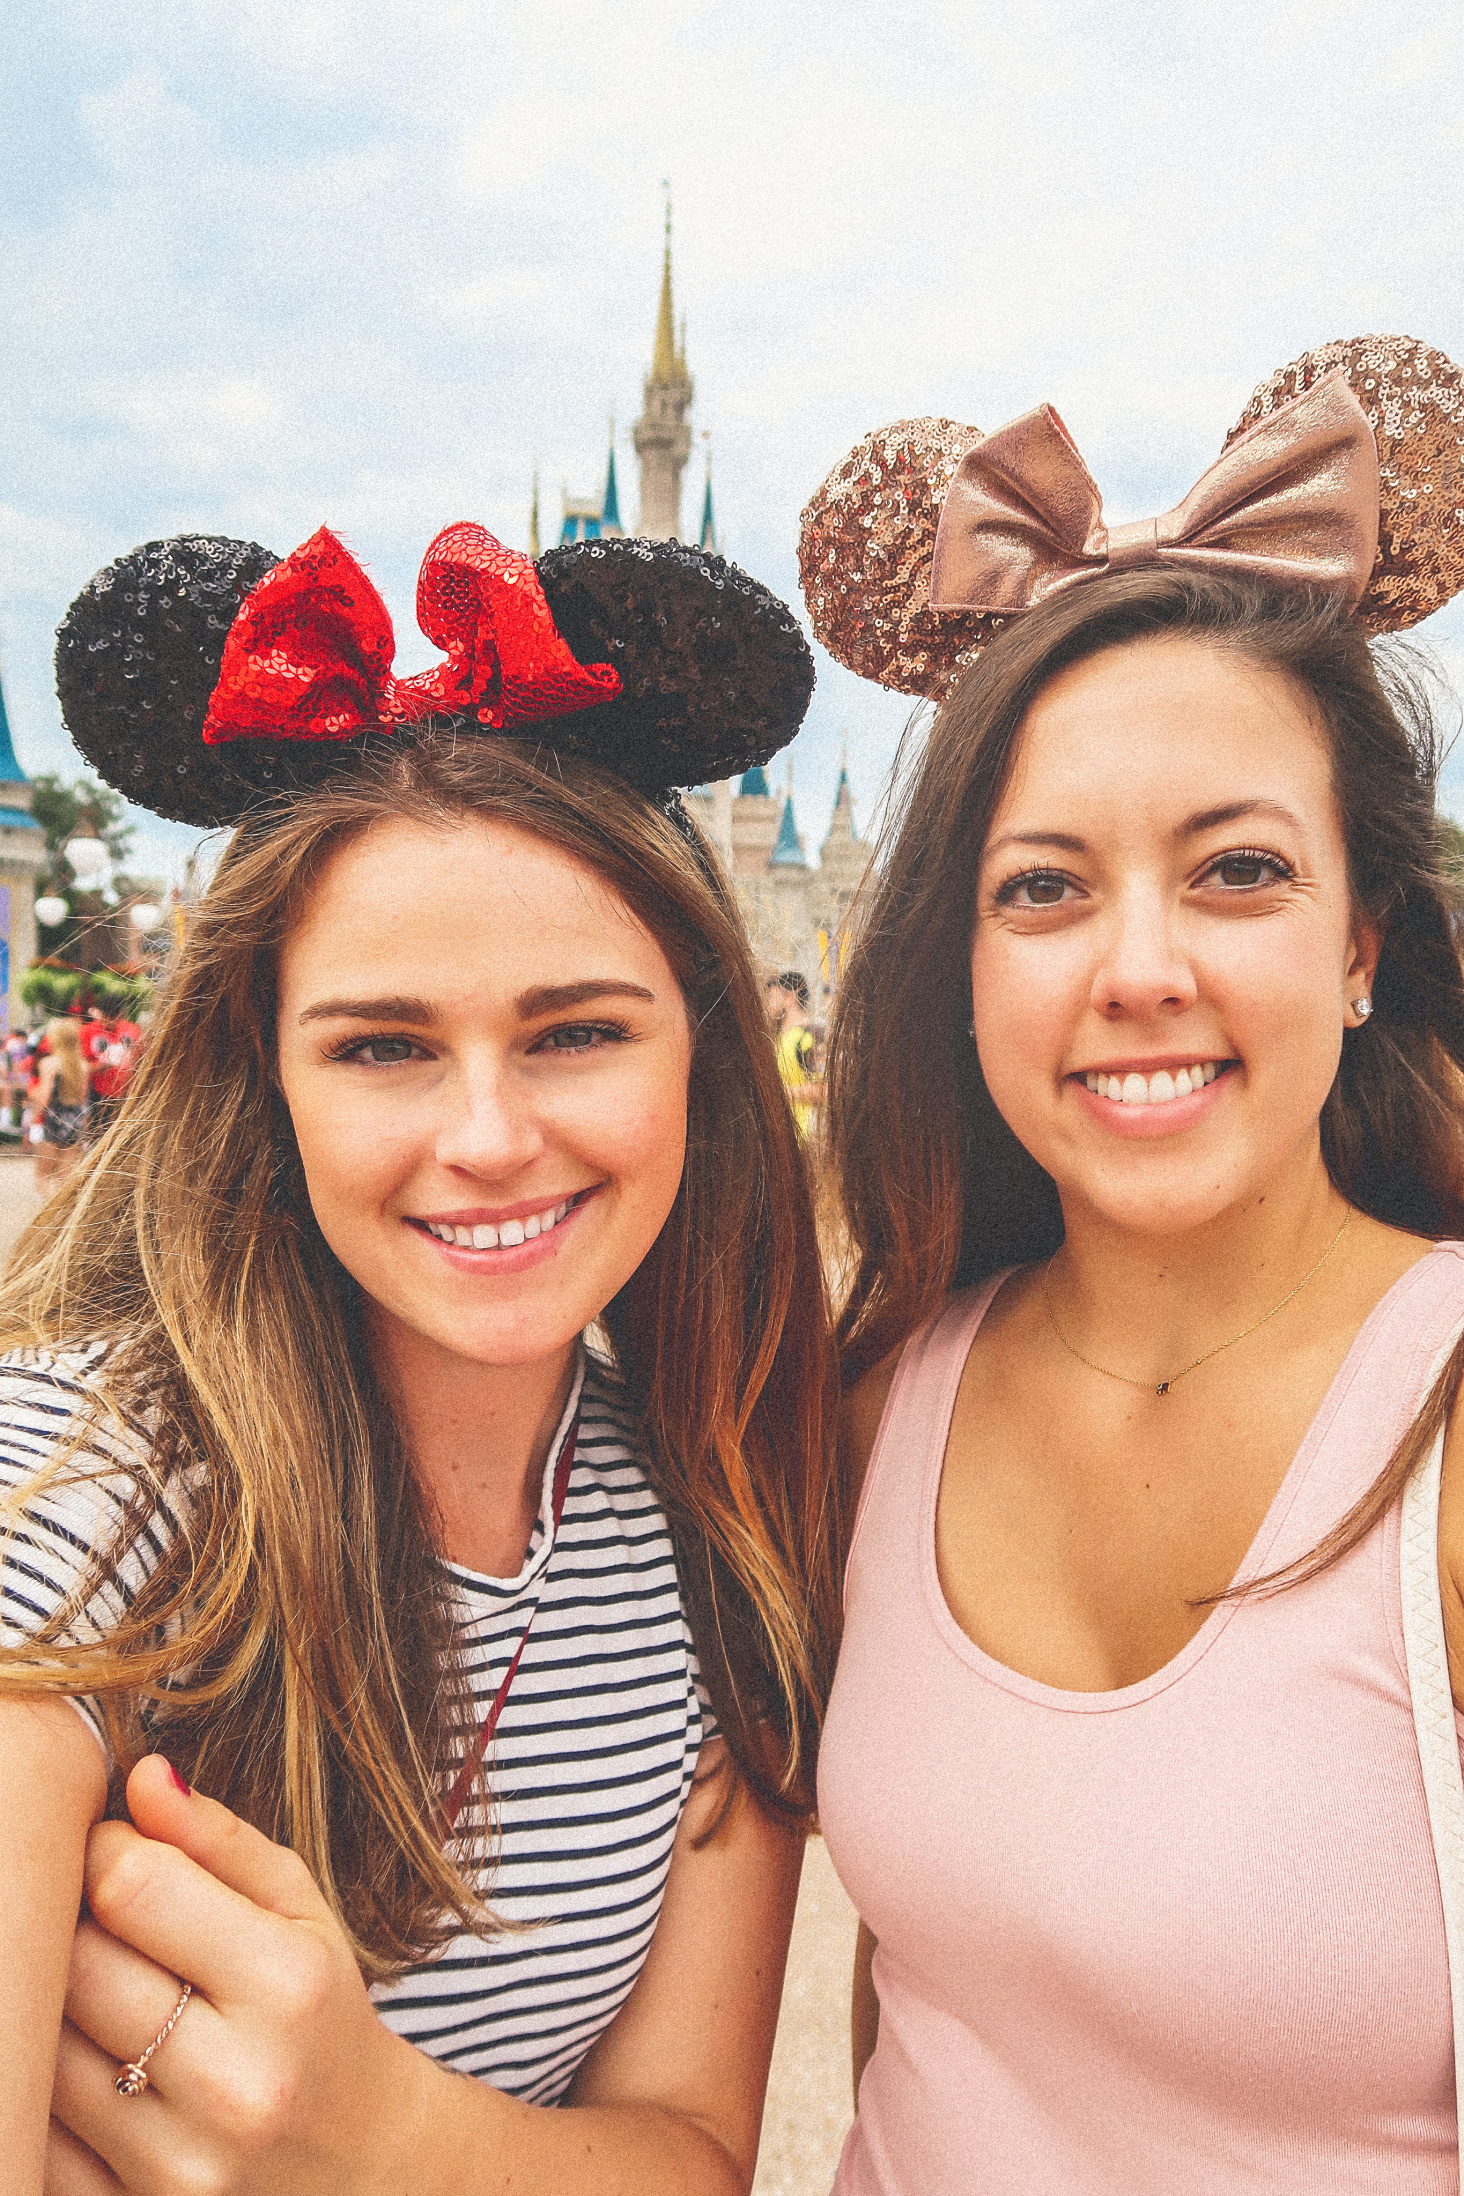 Our Day at Disney World's Magic Kingdom